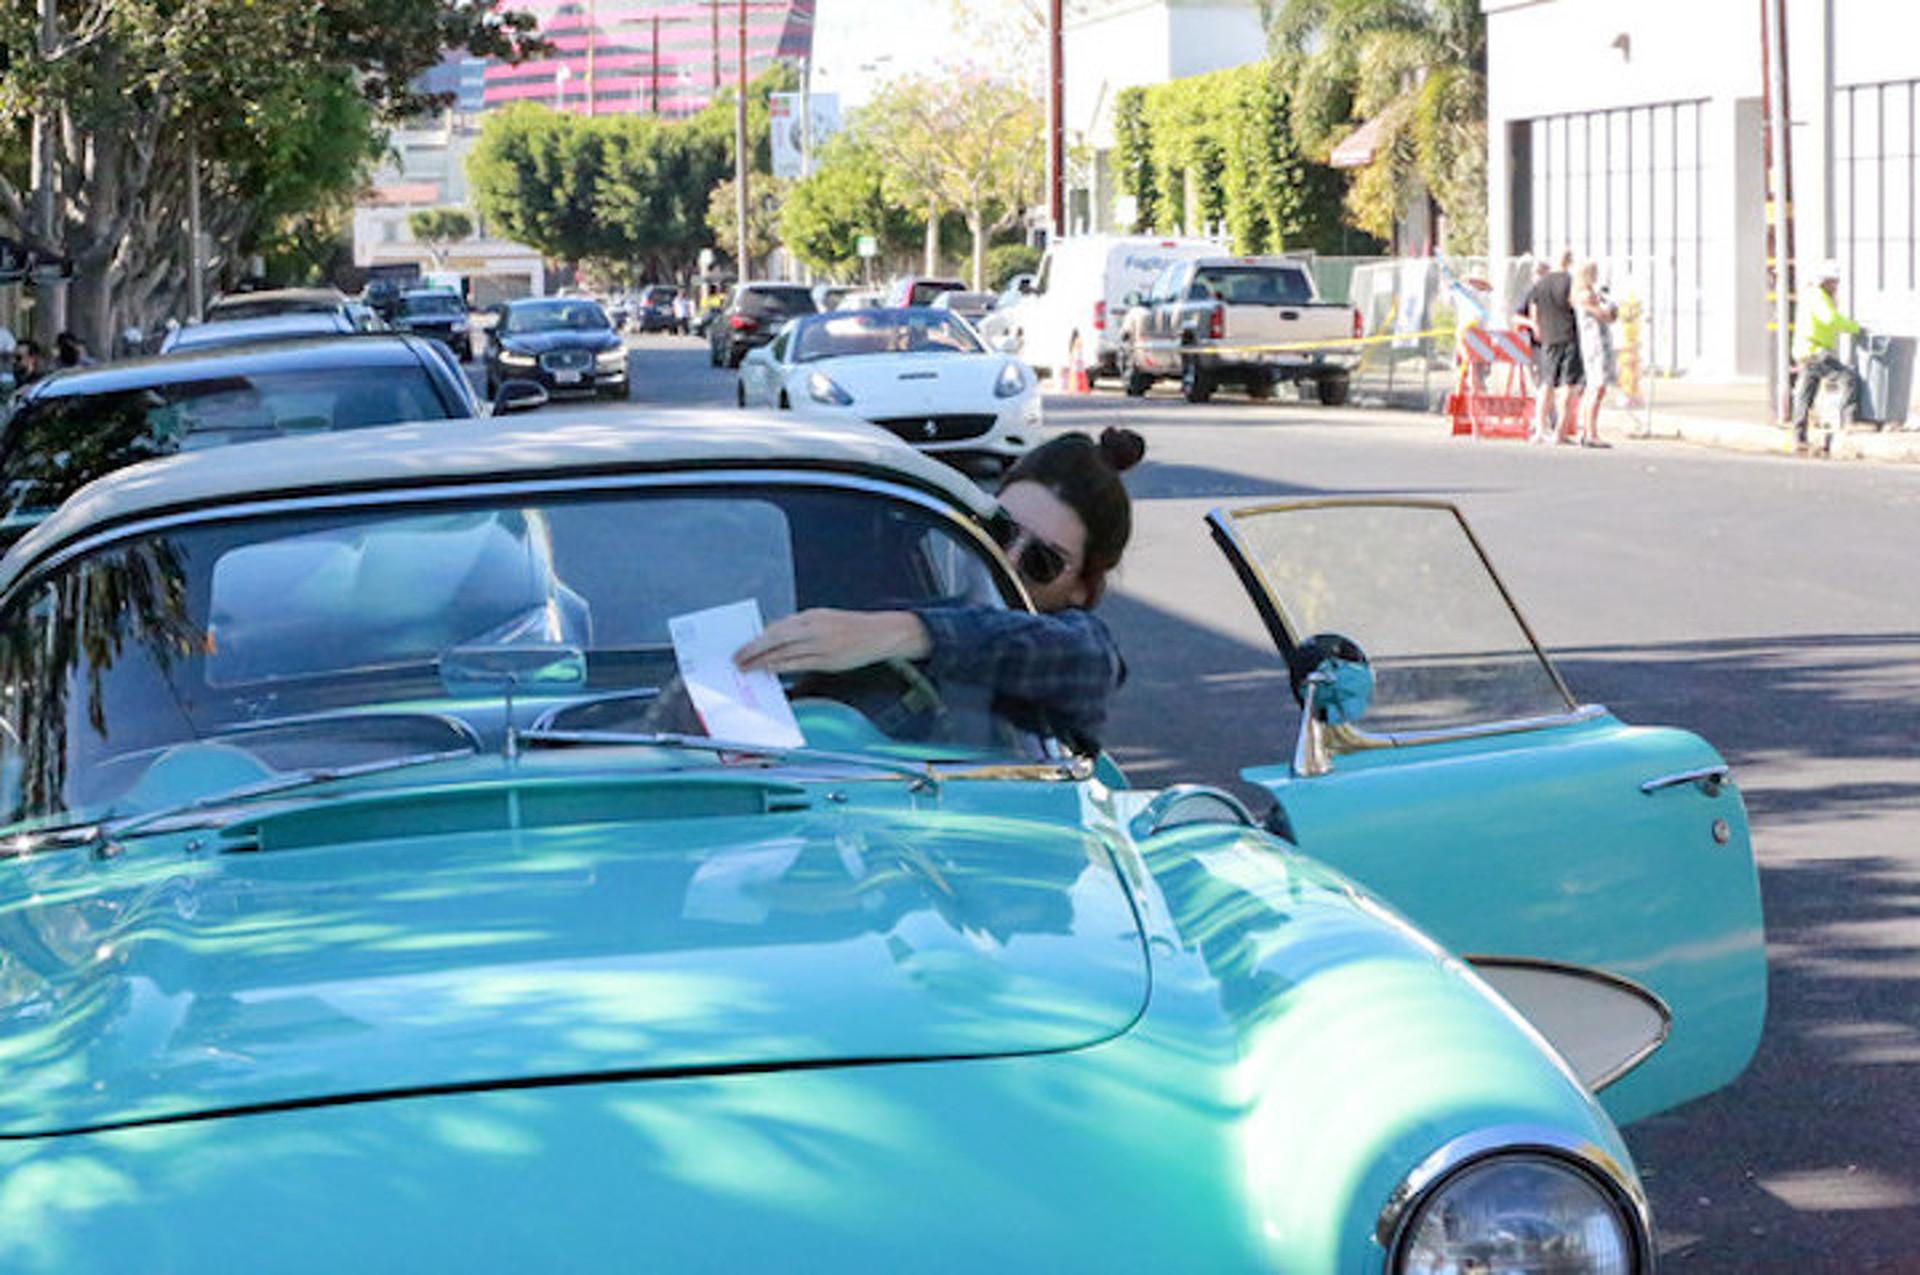 Kendall Jenner saat mengendarai Chevrolet Corvette 1957 berwarna turquoise miliknya.